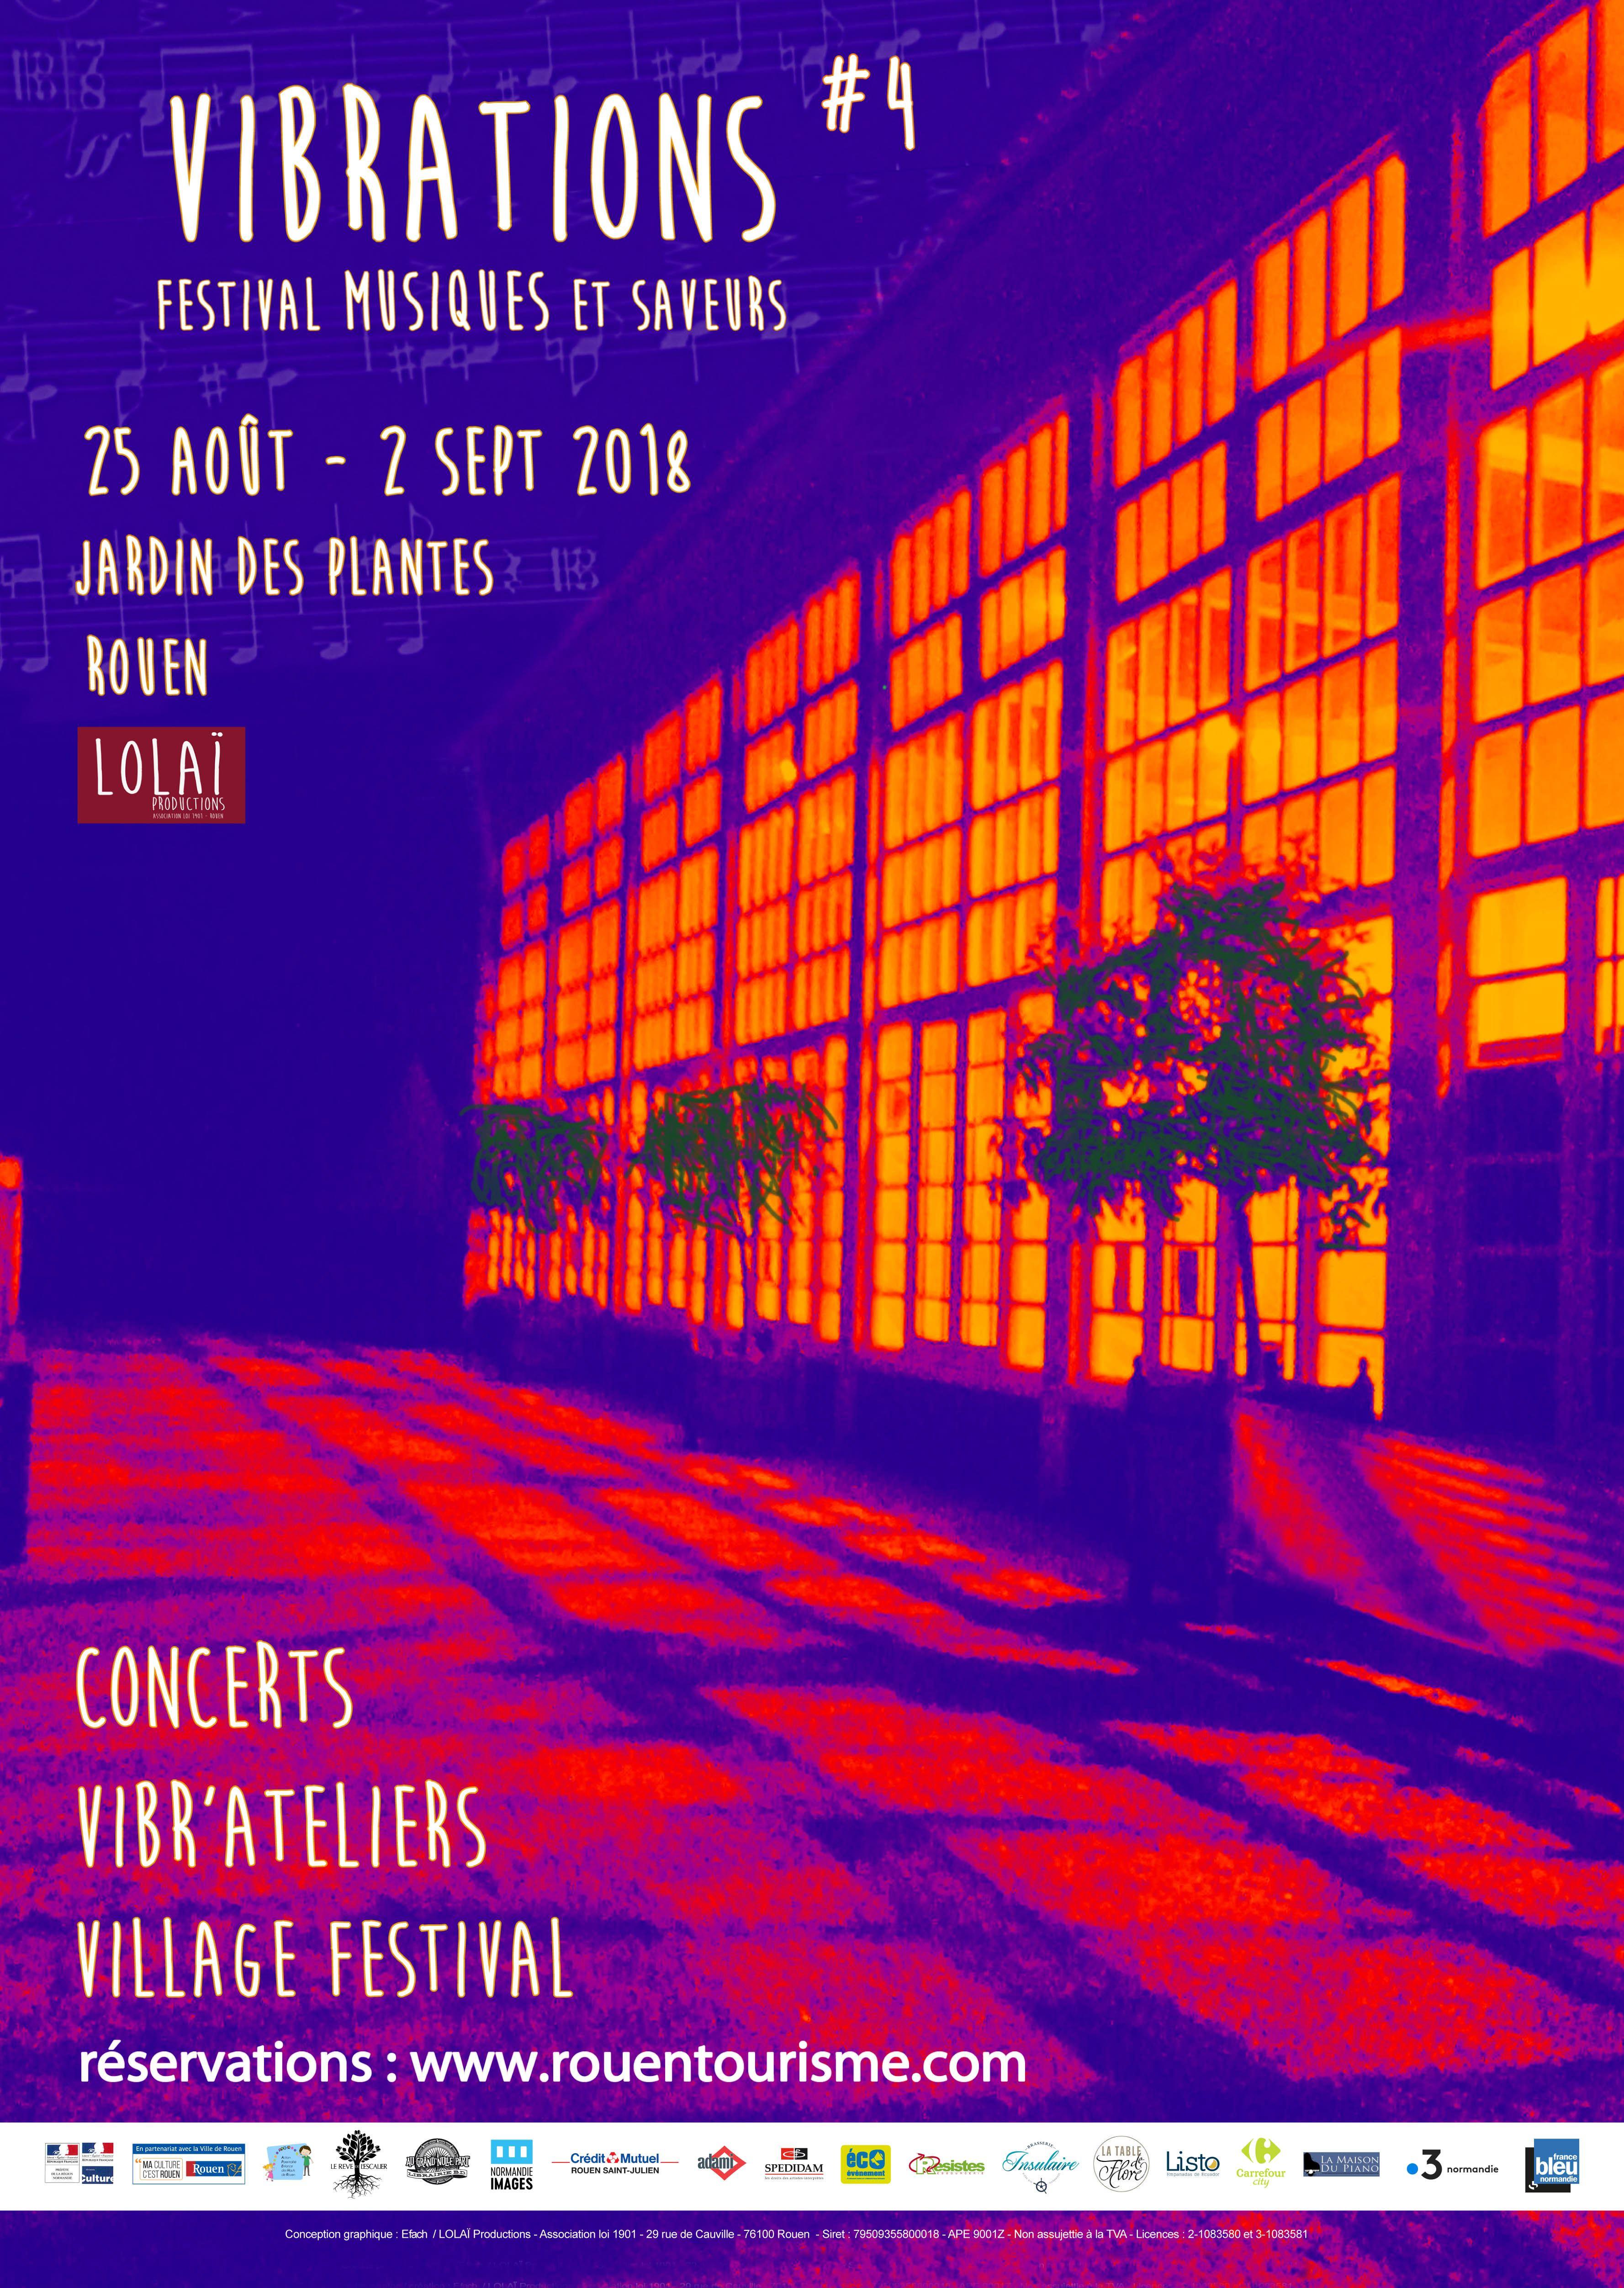 FESTIVAL VIBRATIONS : The Yellbows (Blues/Jazz), vendredi 31 août